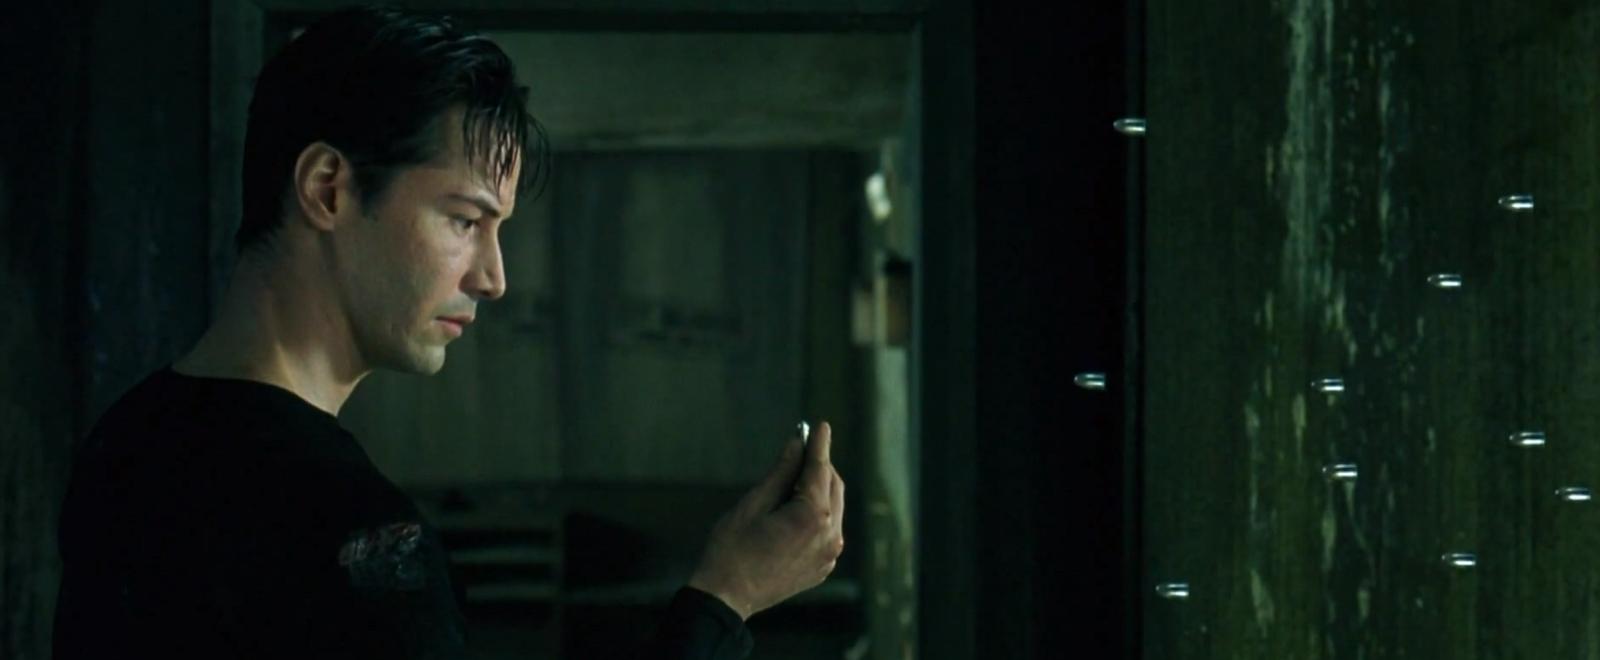 Neo The Matrix 1999 film bullet stop freeze